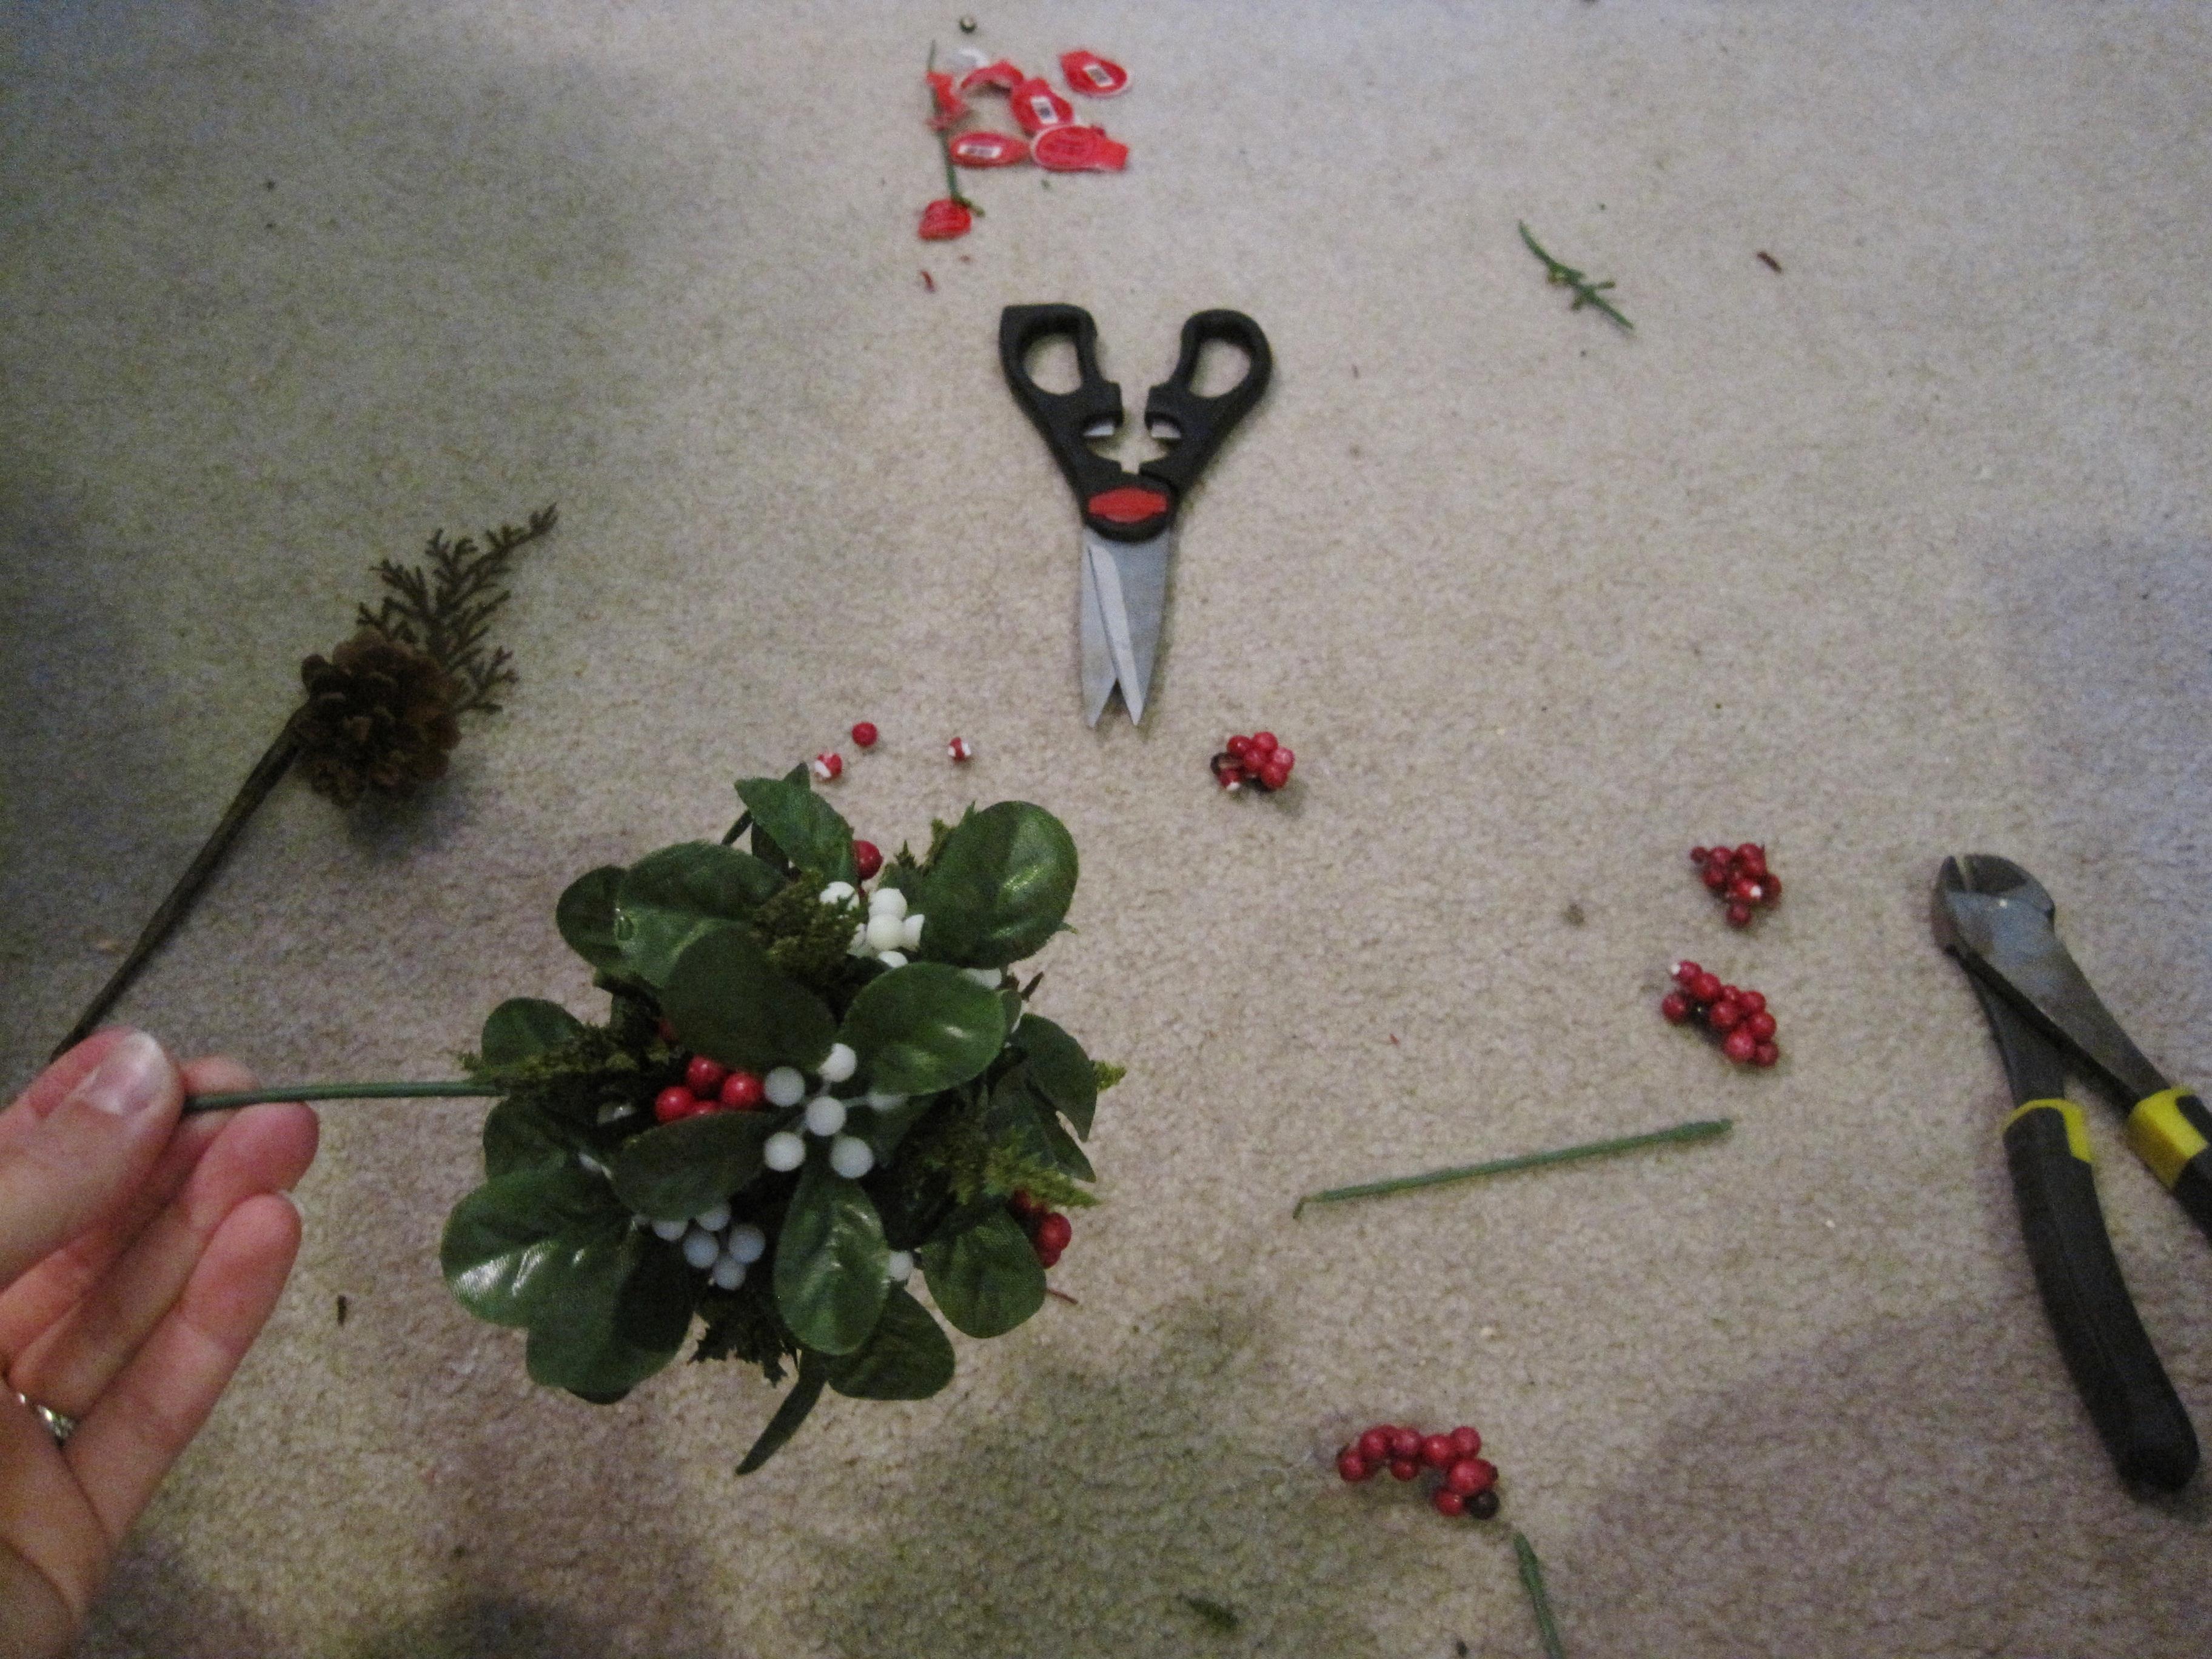 My Own Mistletoe: A DIY Kissing Ball - Loving Here